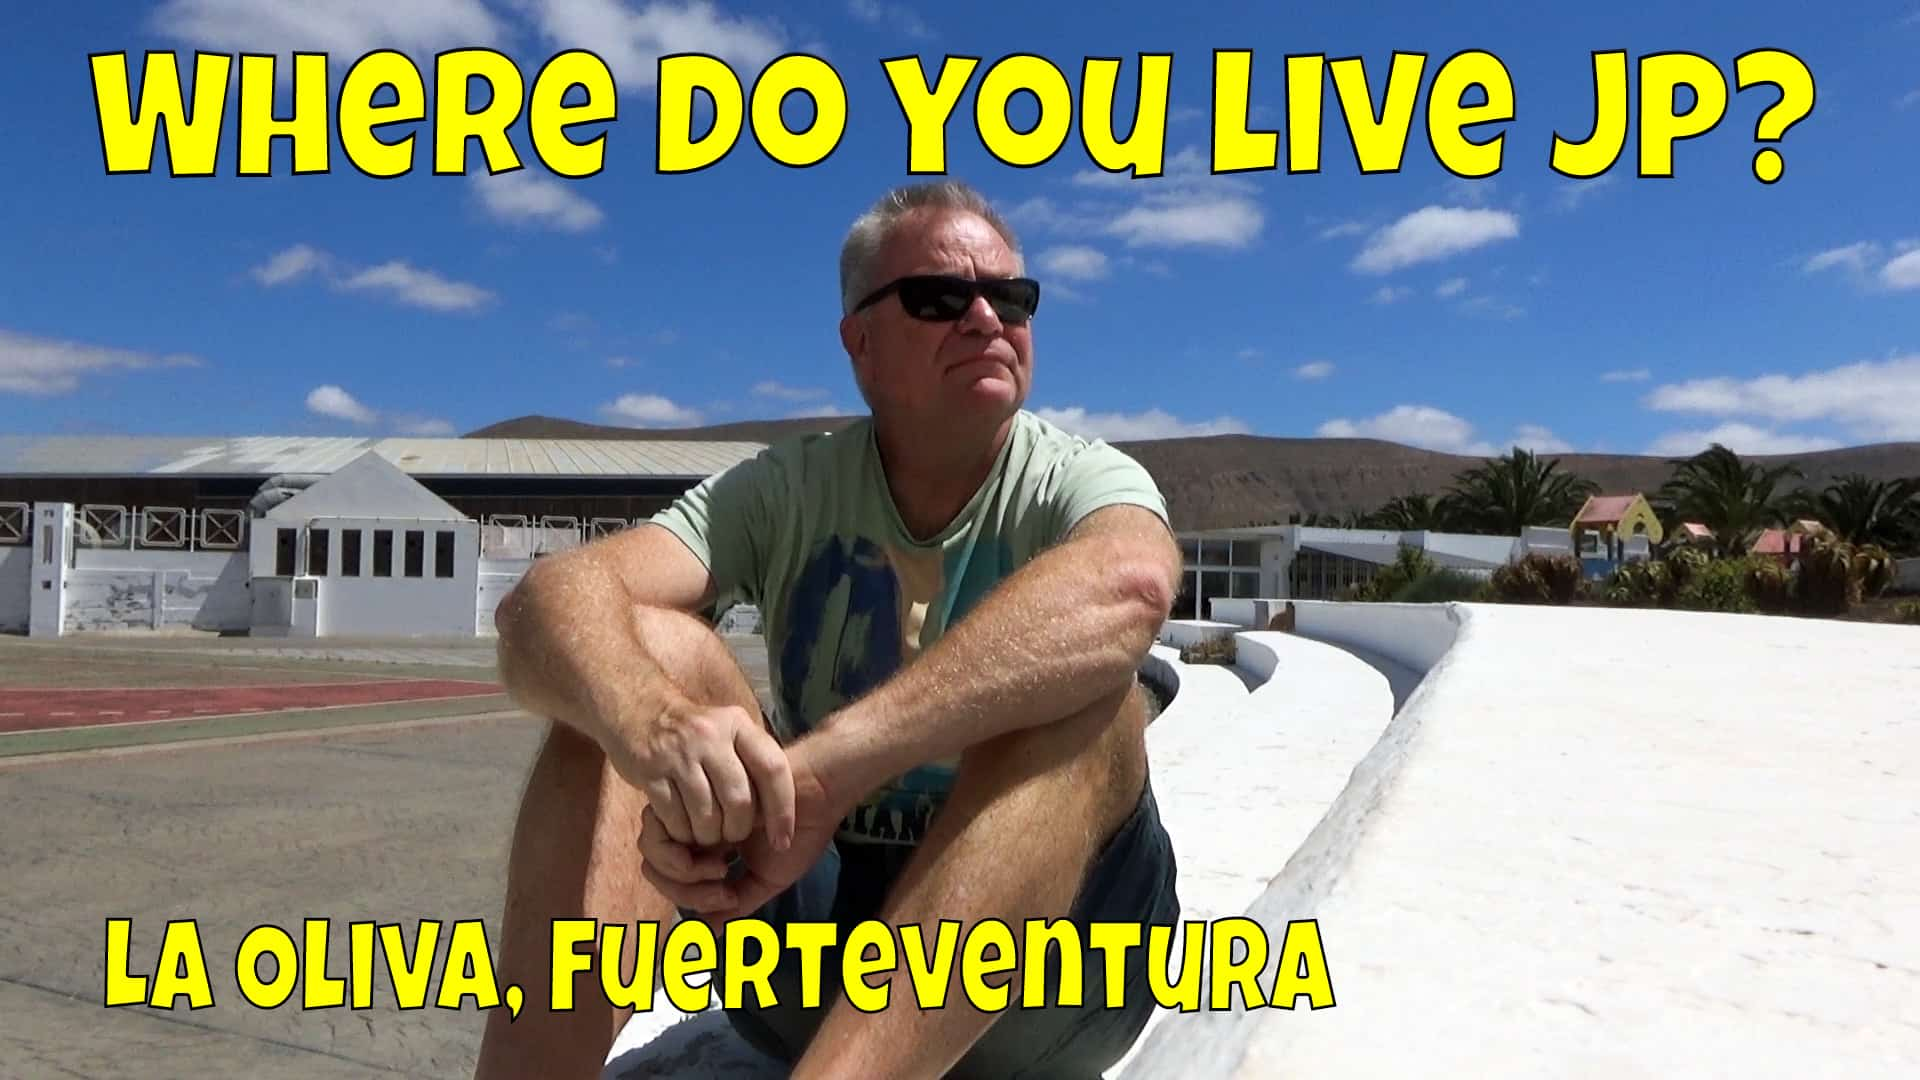 Where to live in Fuerteventura - La Oliva Fuerteventura